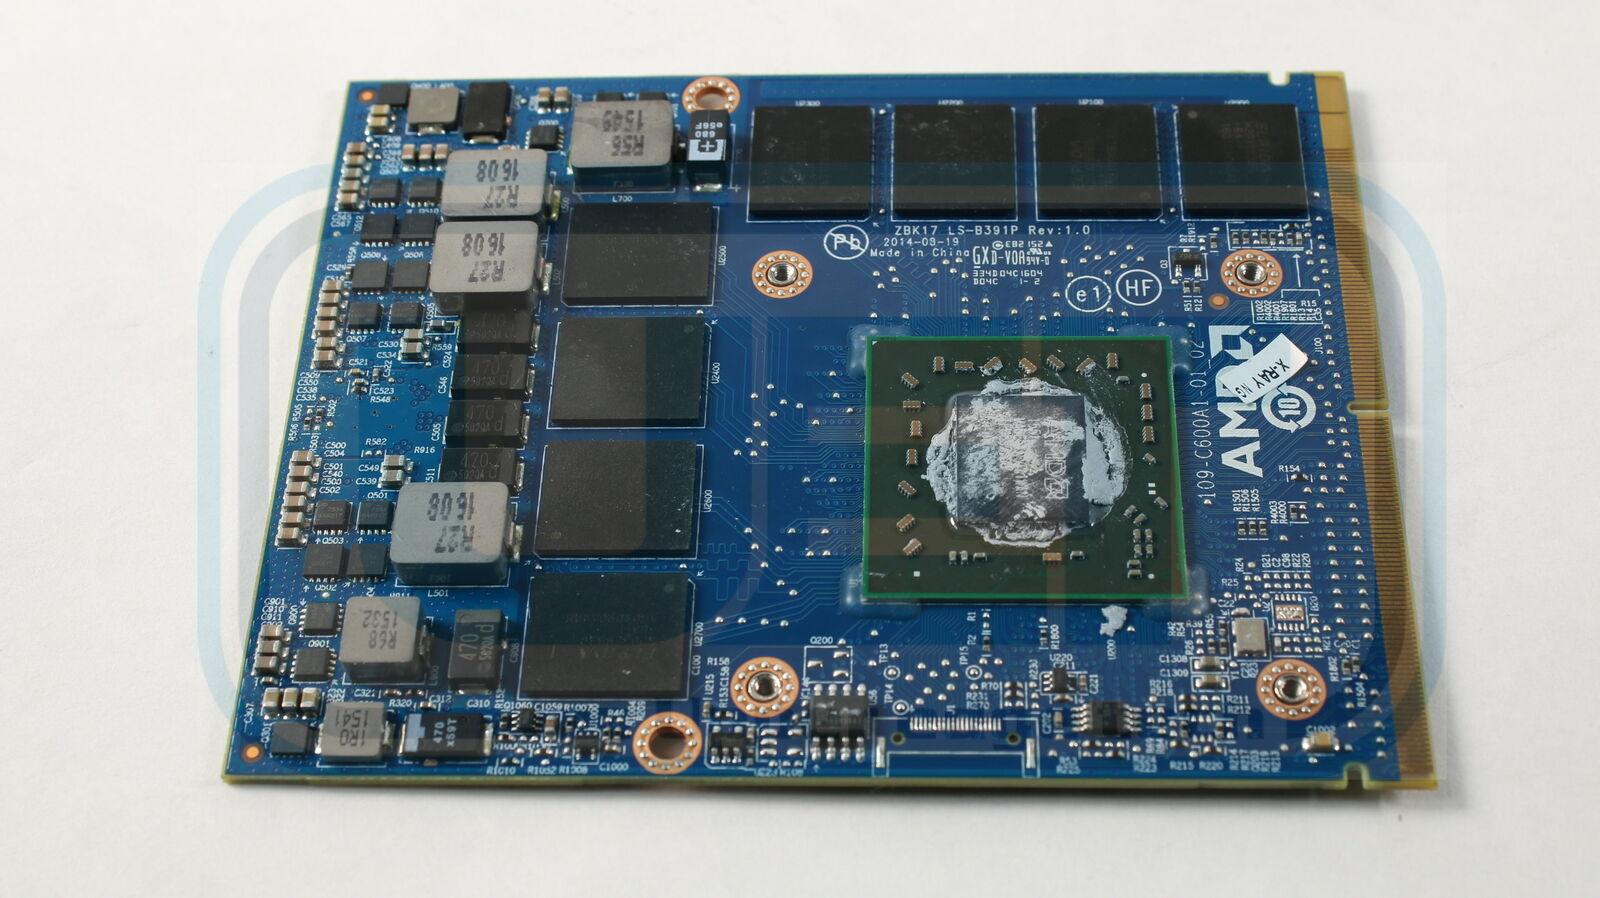 HP Zbook 17 G2 Video Graphics Card GPU LS-B391P AMD W6170M 2GB Tested Warranty